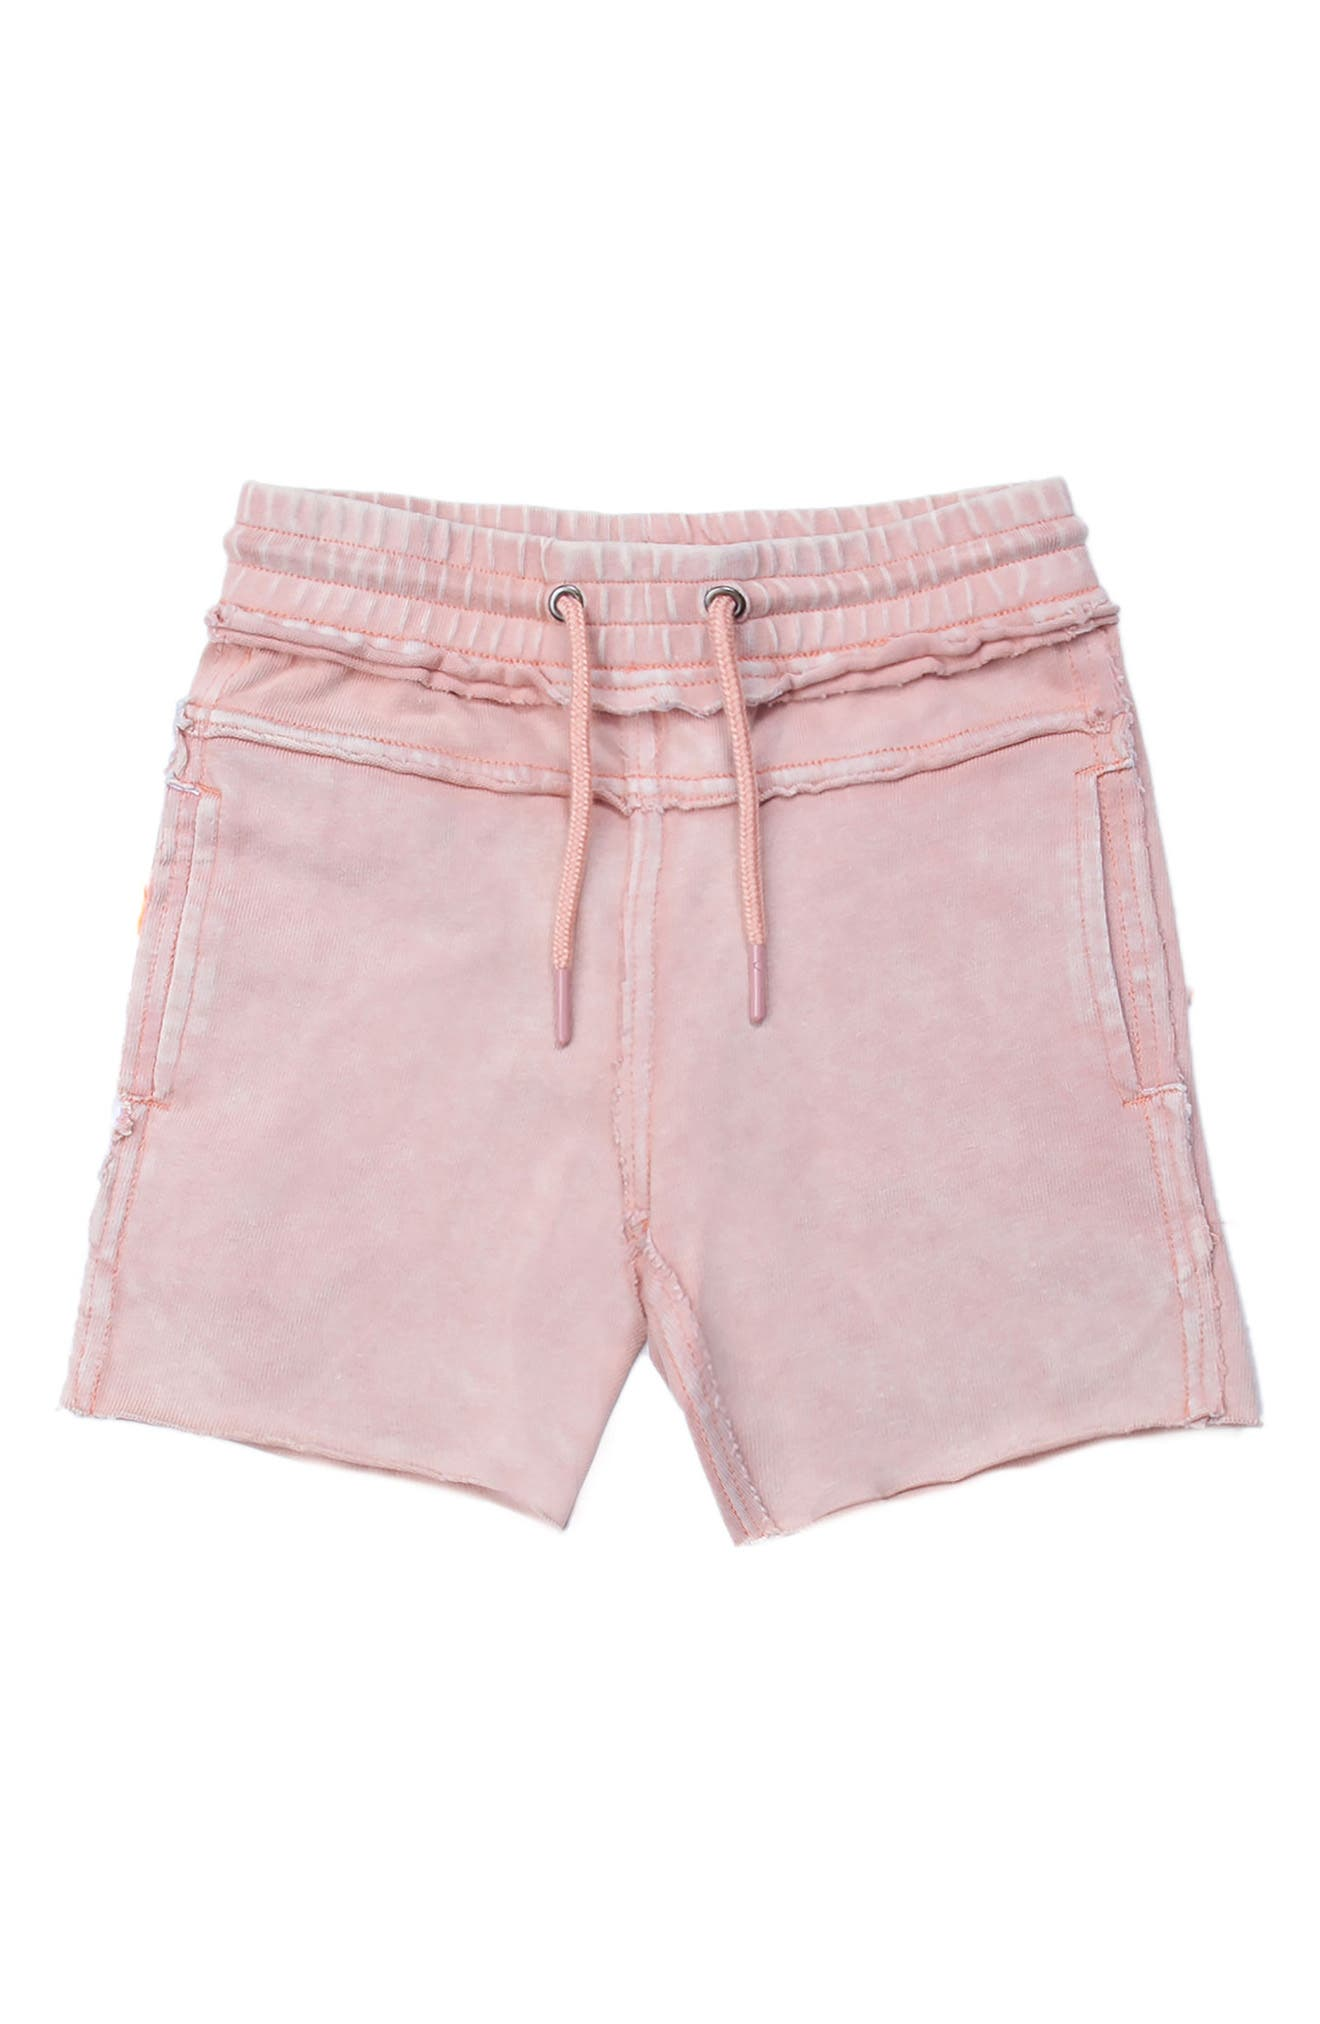 Kirk Distressed Shorts,                         Main,                         color, Pink